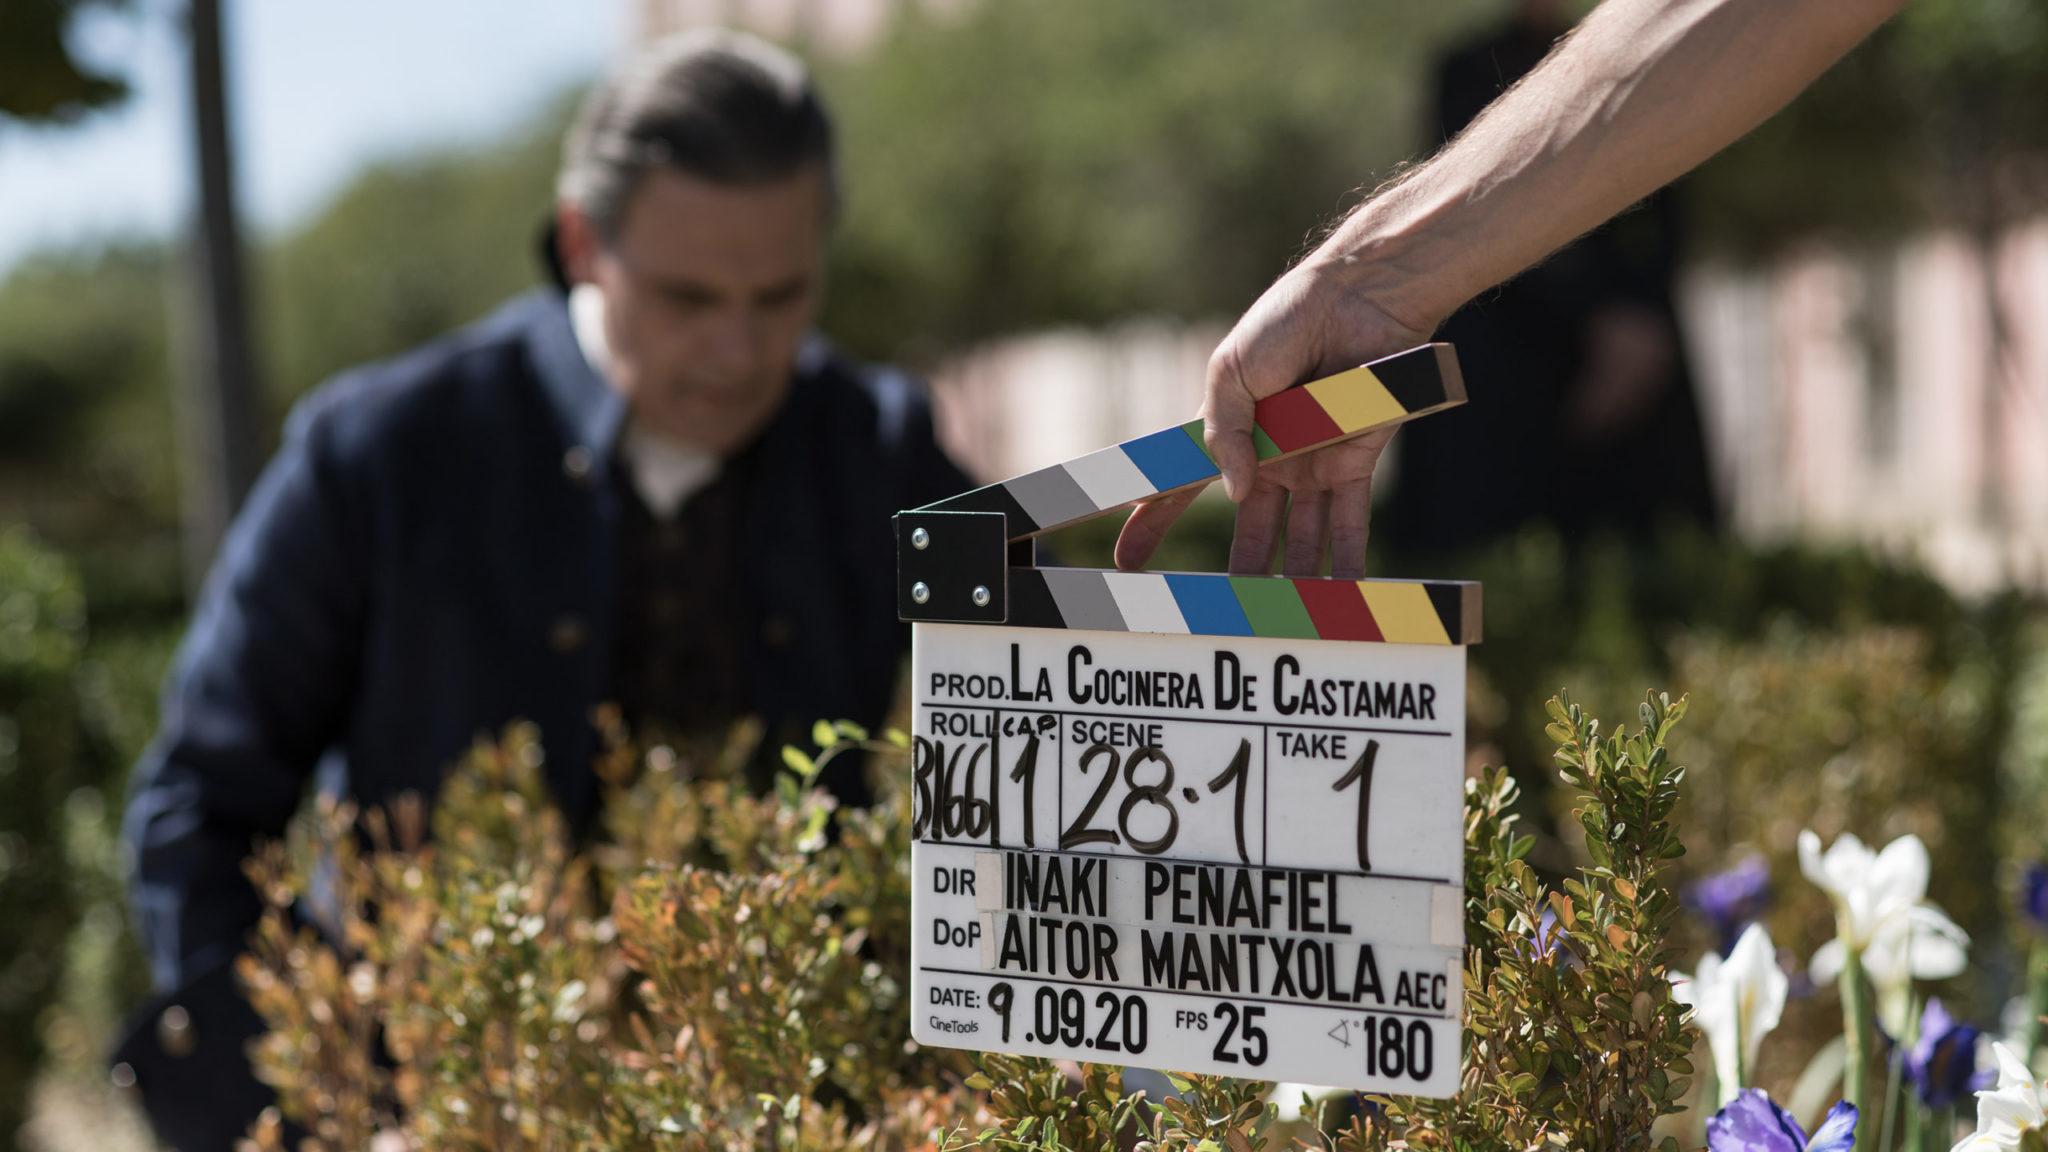 'The cook of Castamar', produced by Buendía Estudios, ends its filming